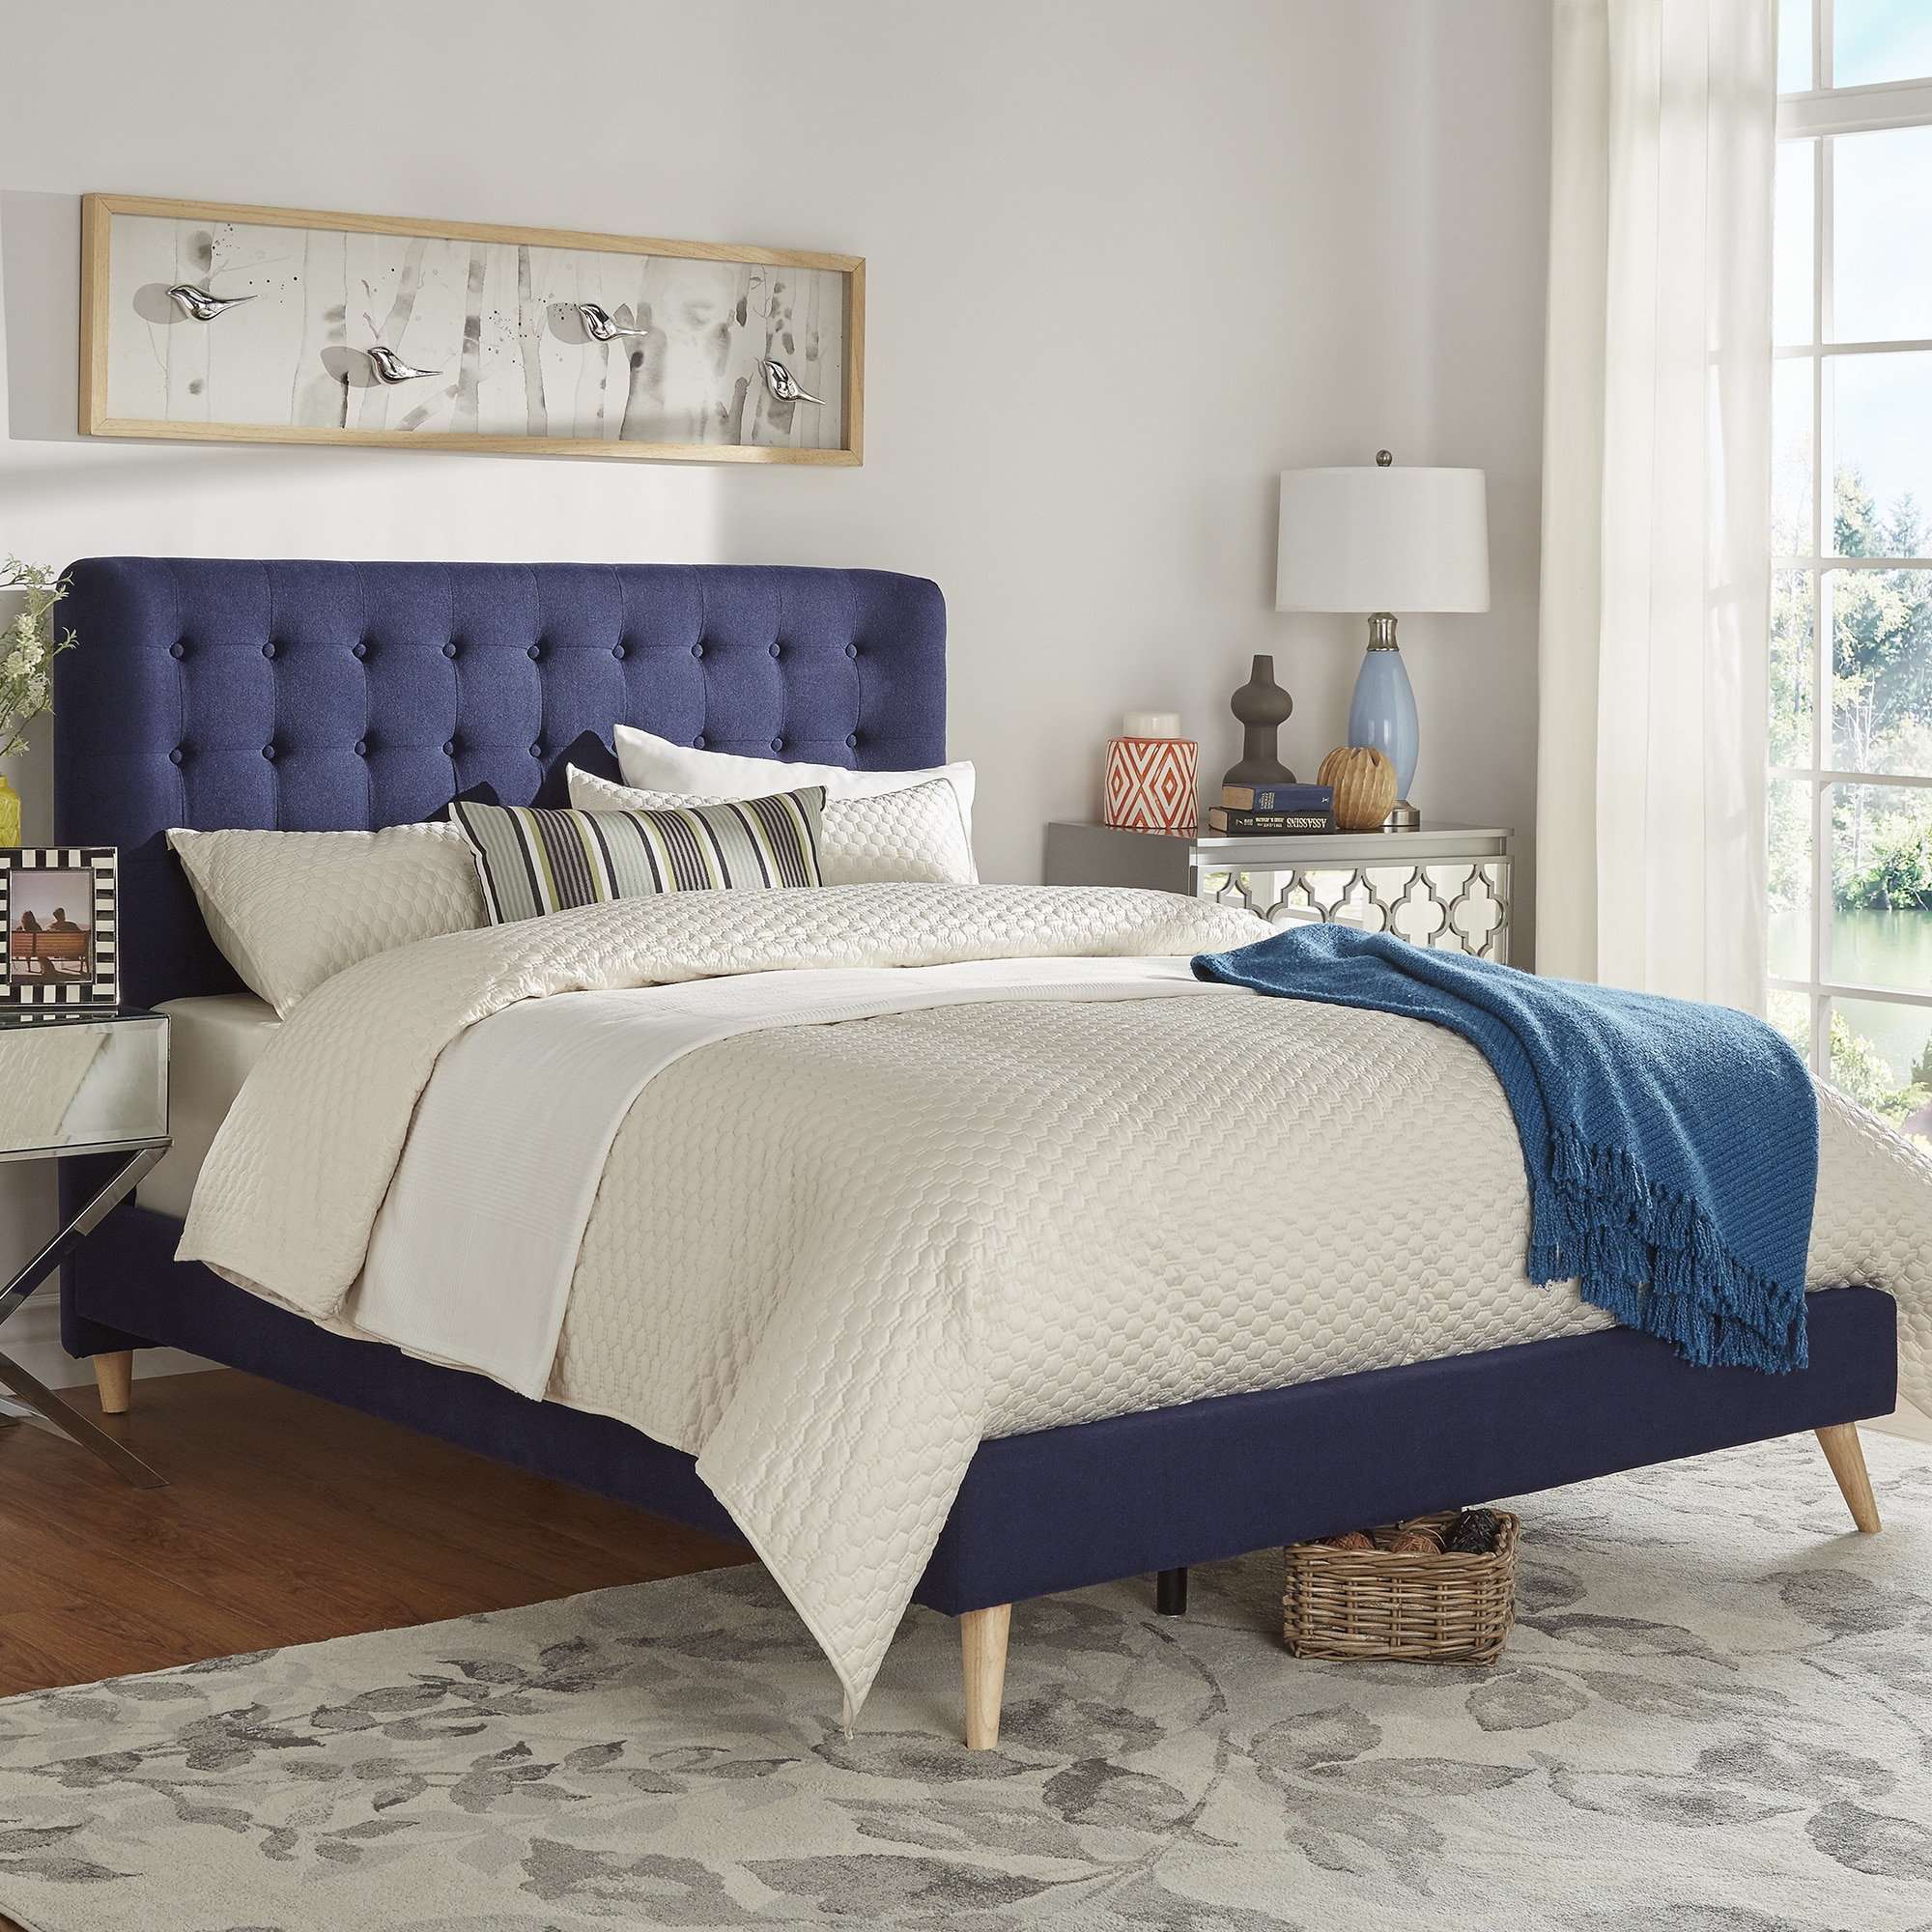 Niels Danish Modern Tufted Fabric Upholstered King Size B...